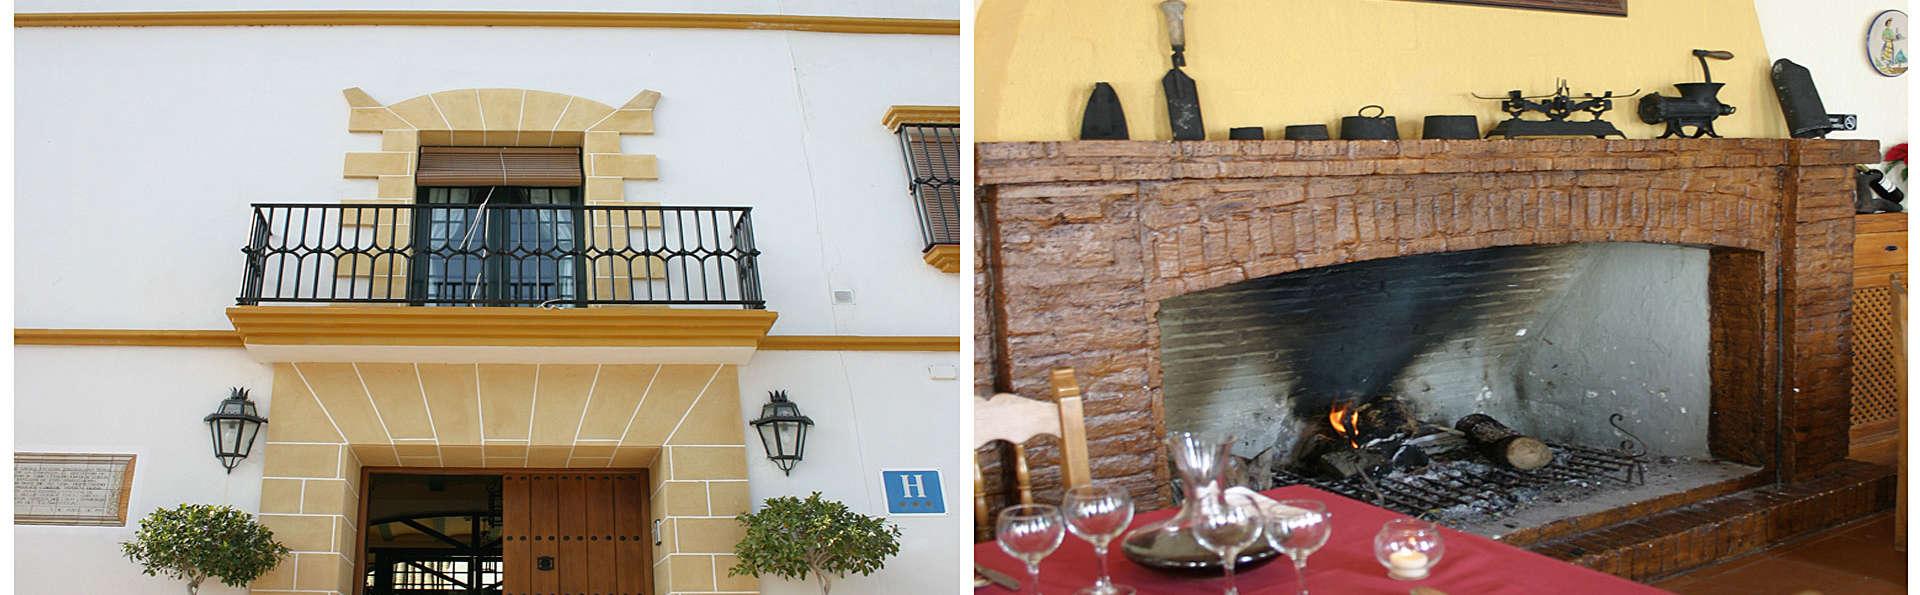 Hotel Mesón de la Molinera - edit_front_restaurant.jpg